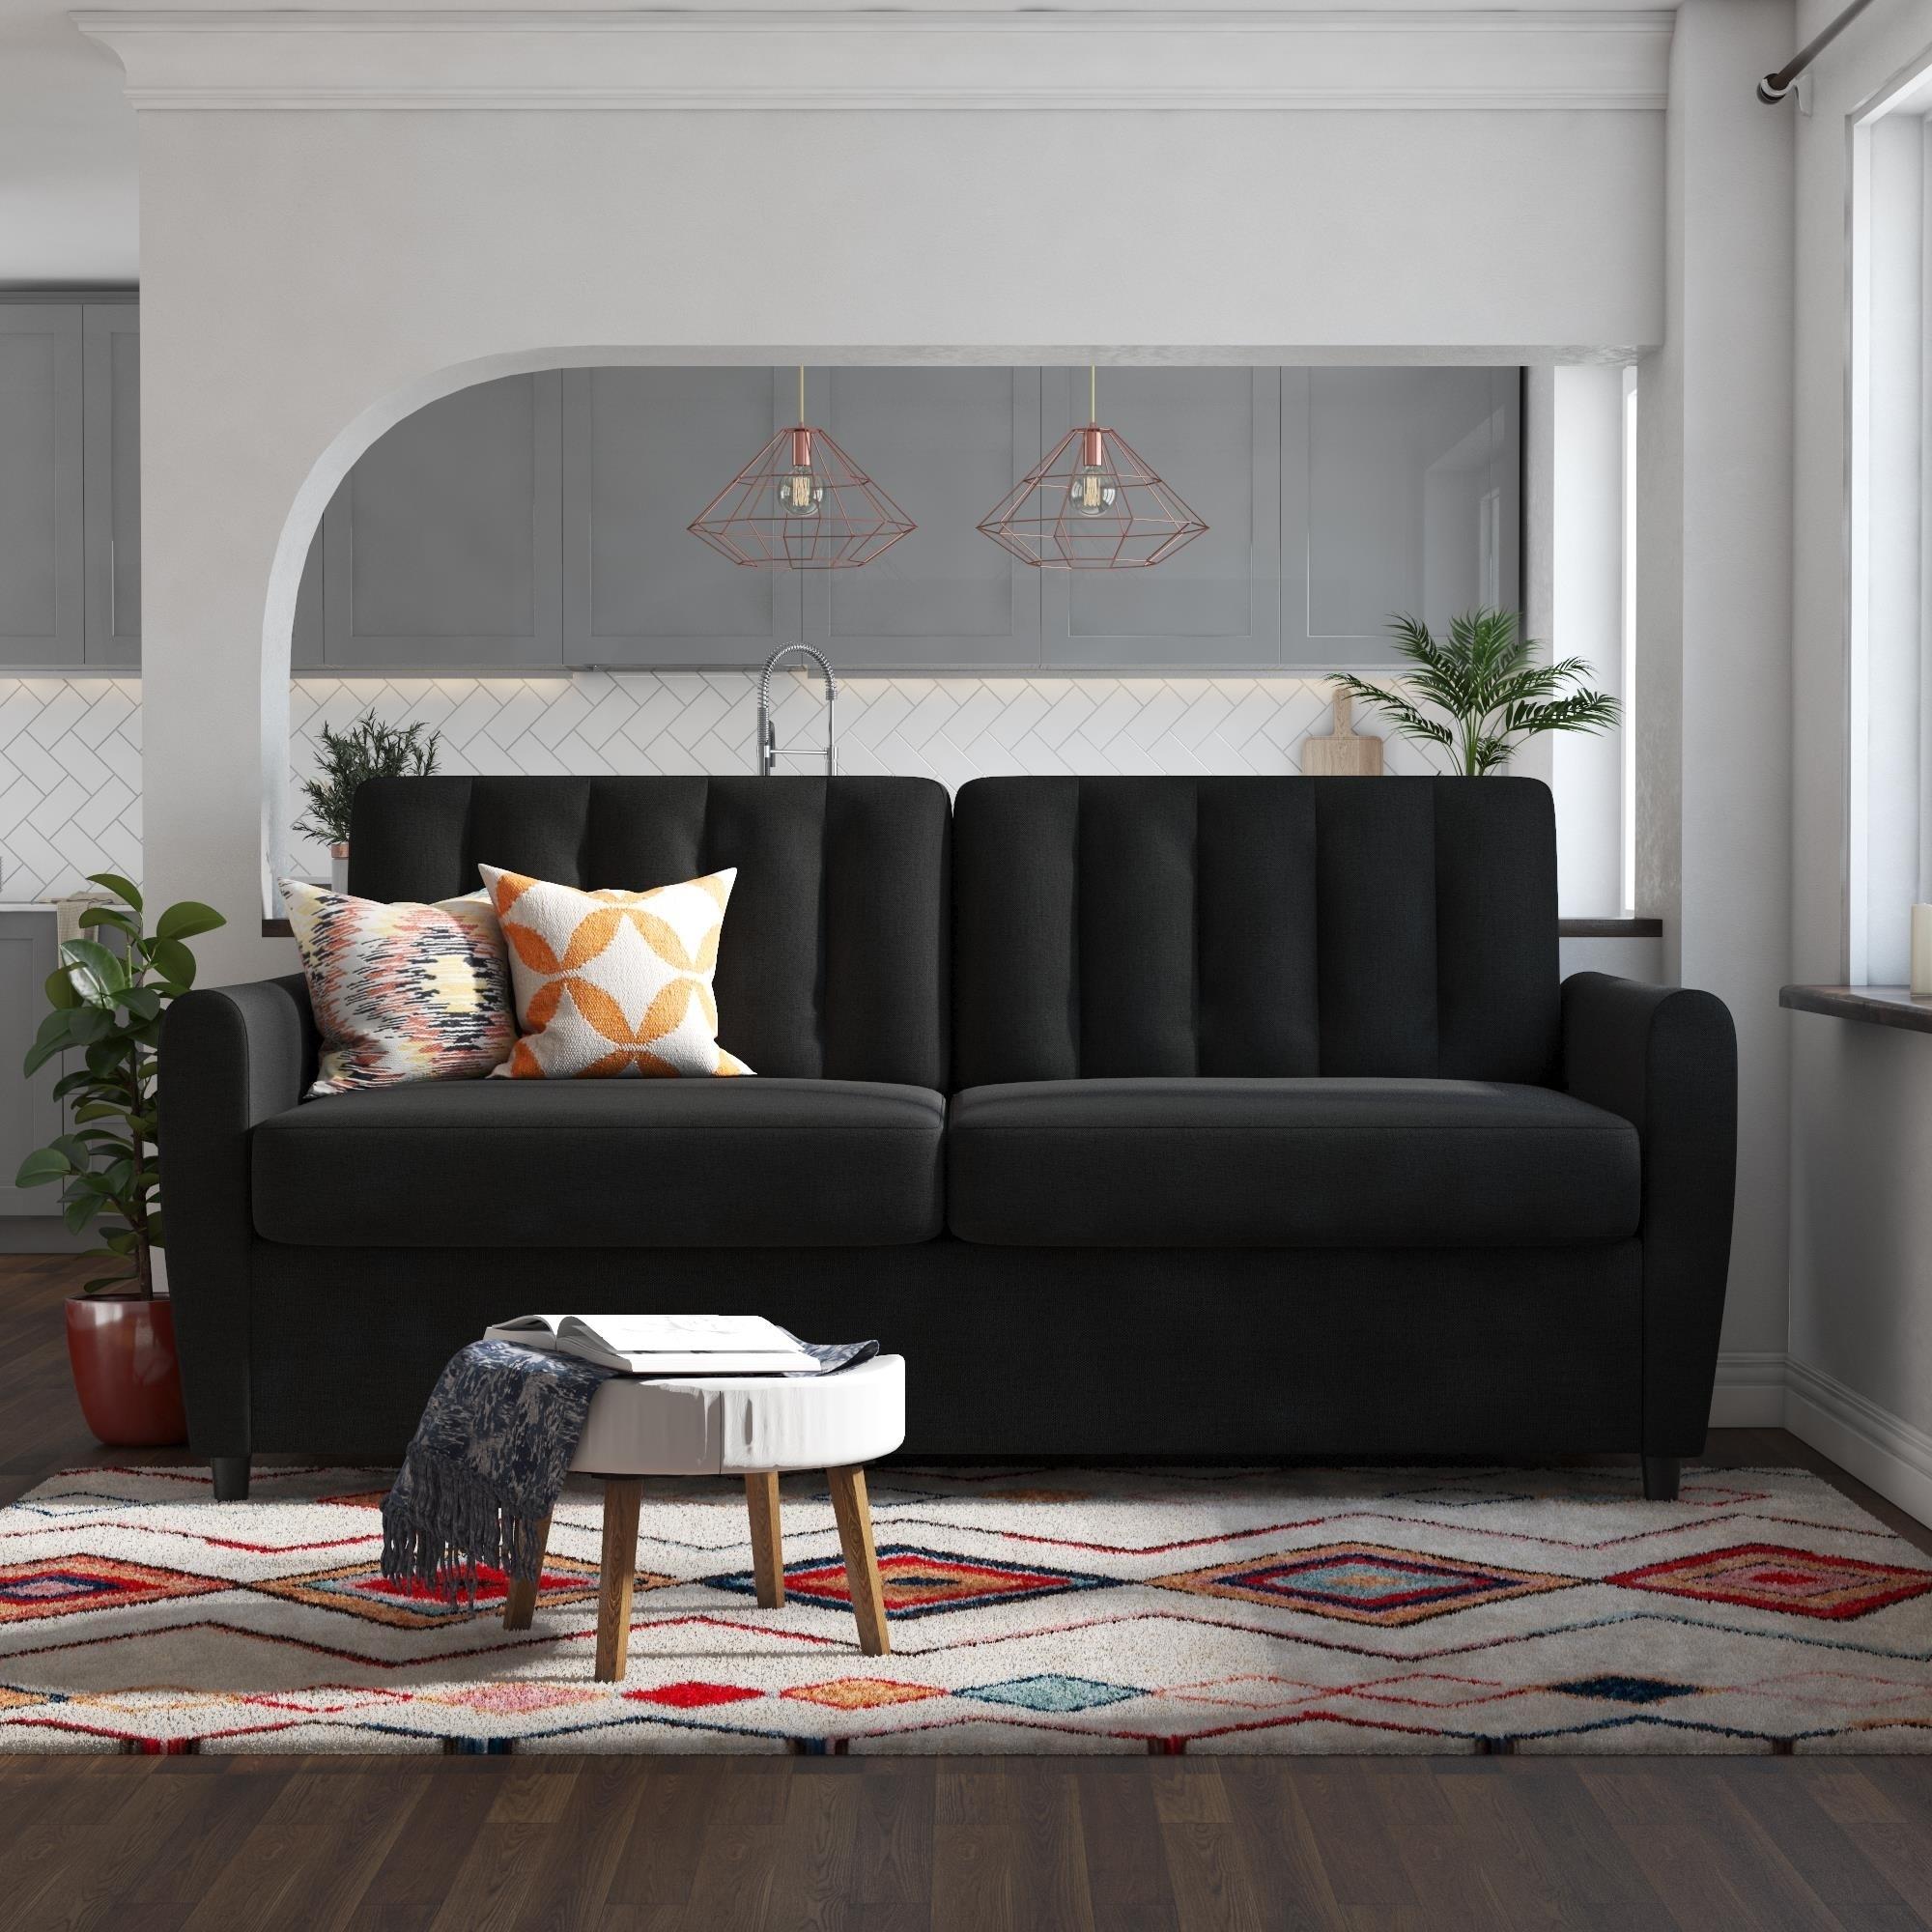 Shop Novogratz Brittany Certipur Us Memory Foam Queen Sleeper Sofa